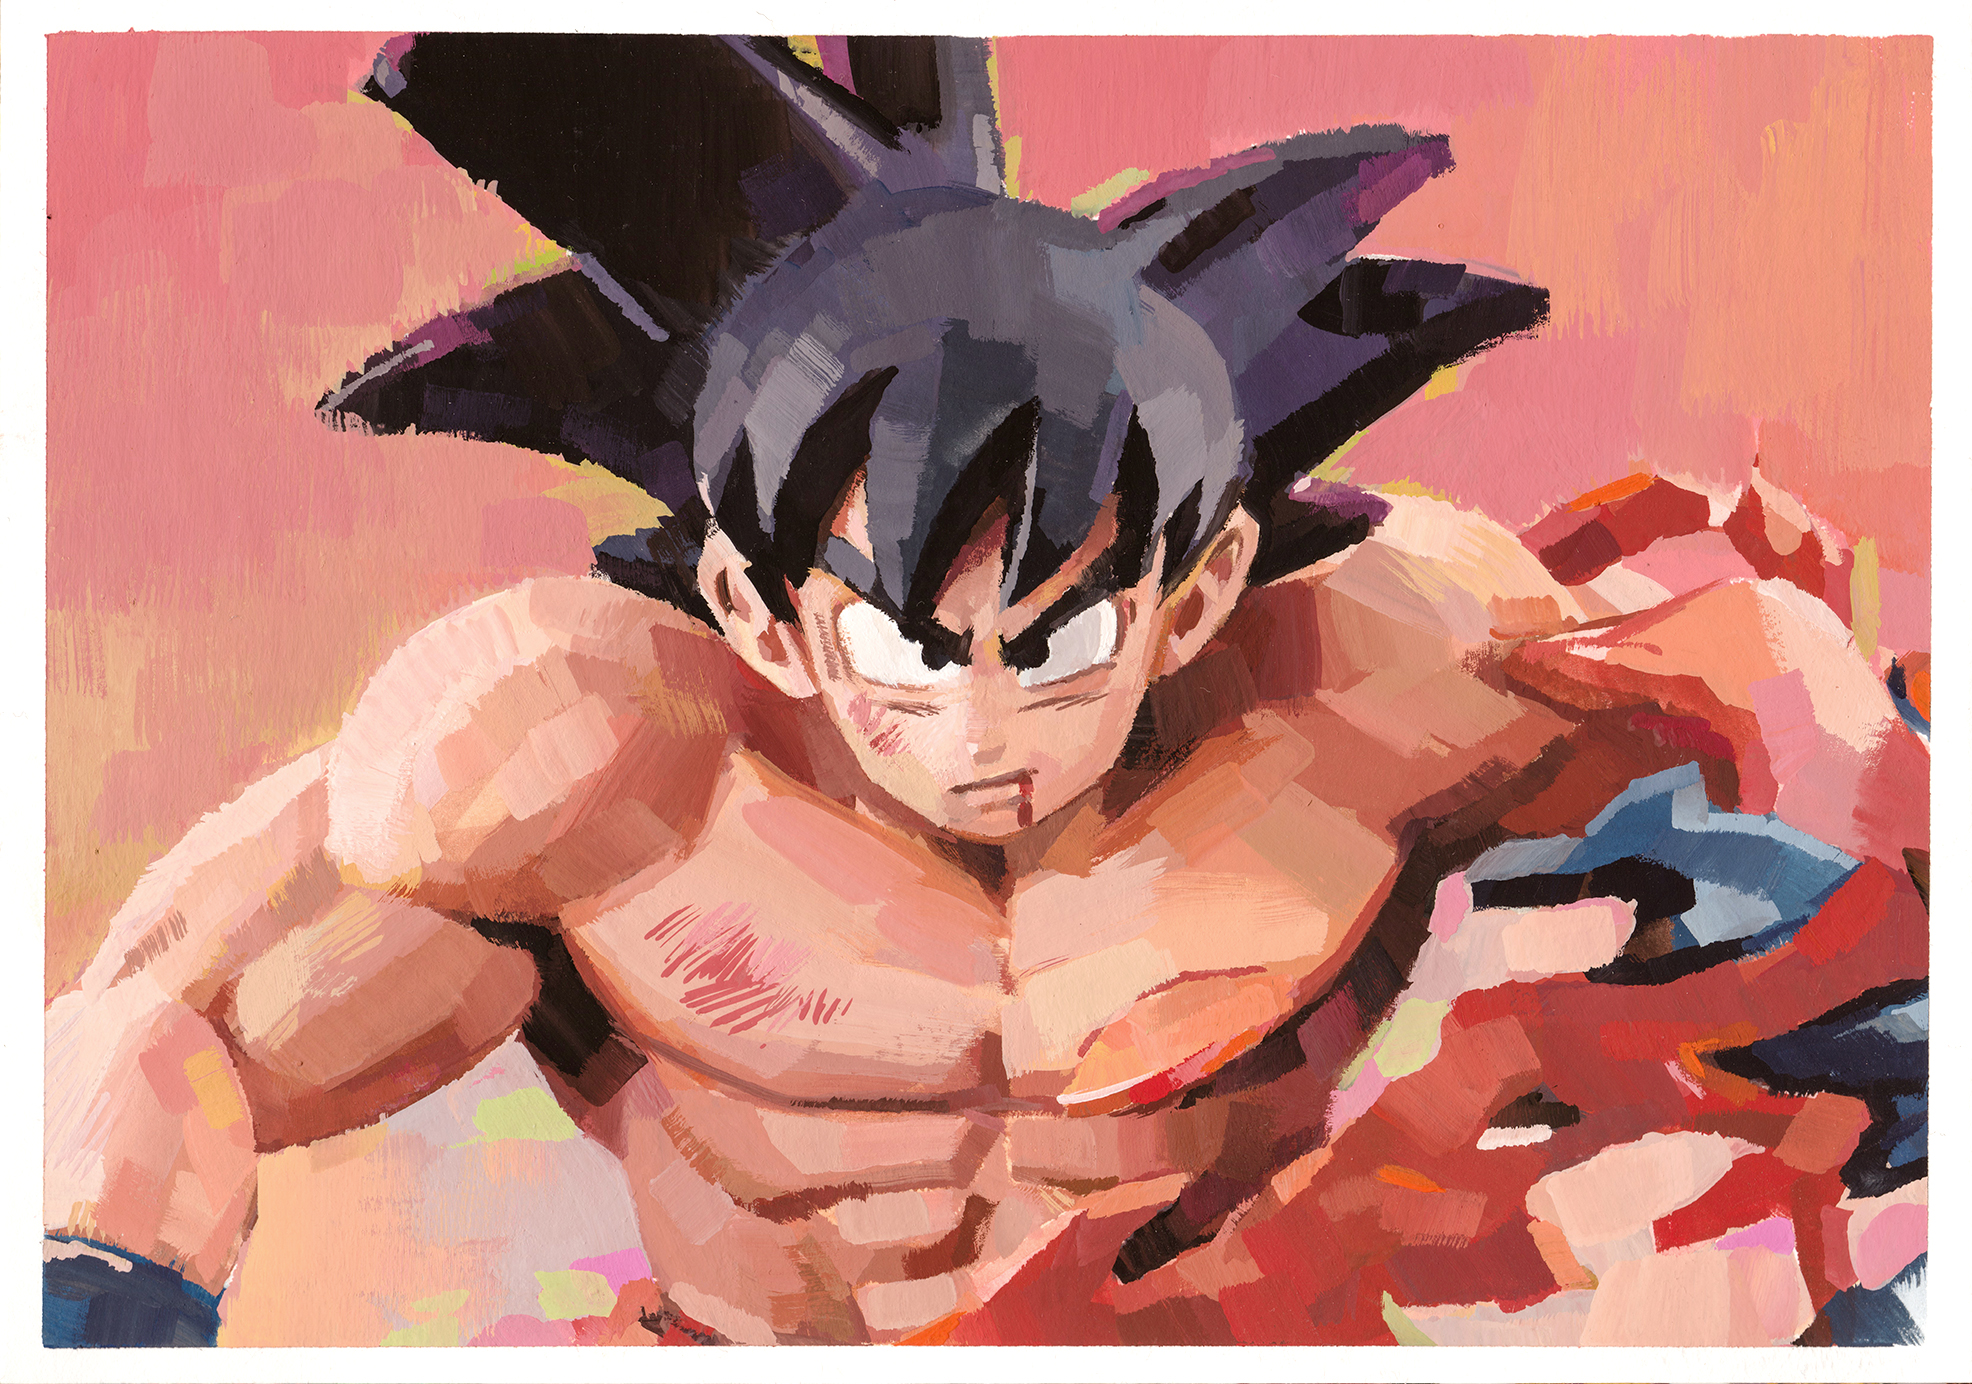 Goku_small.jpg